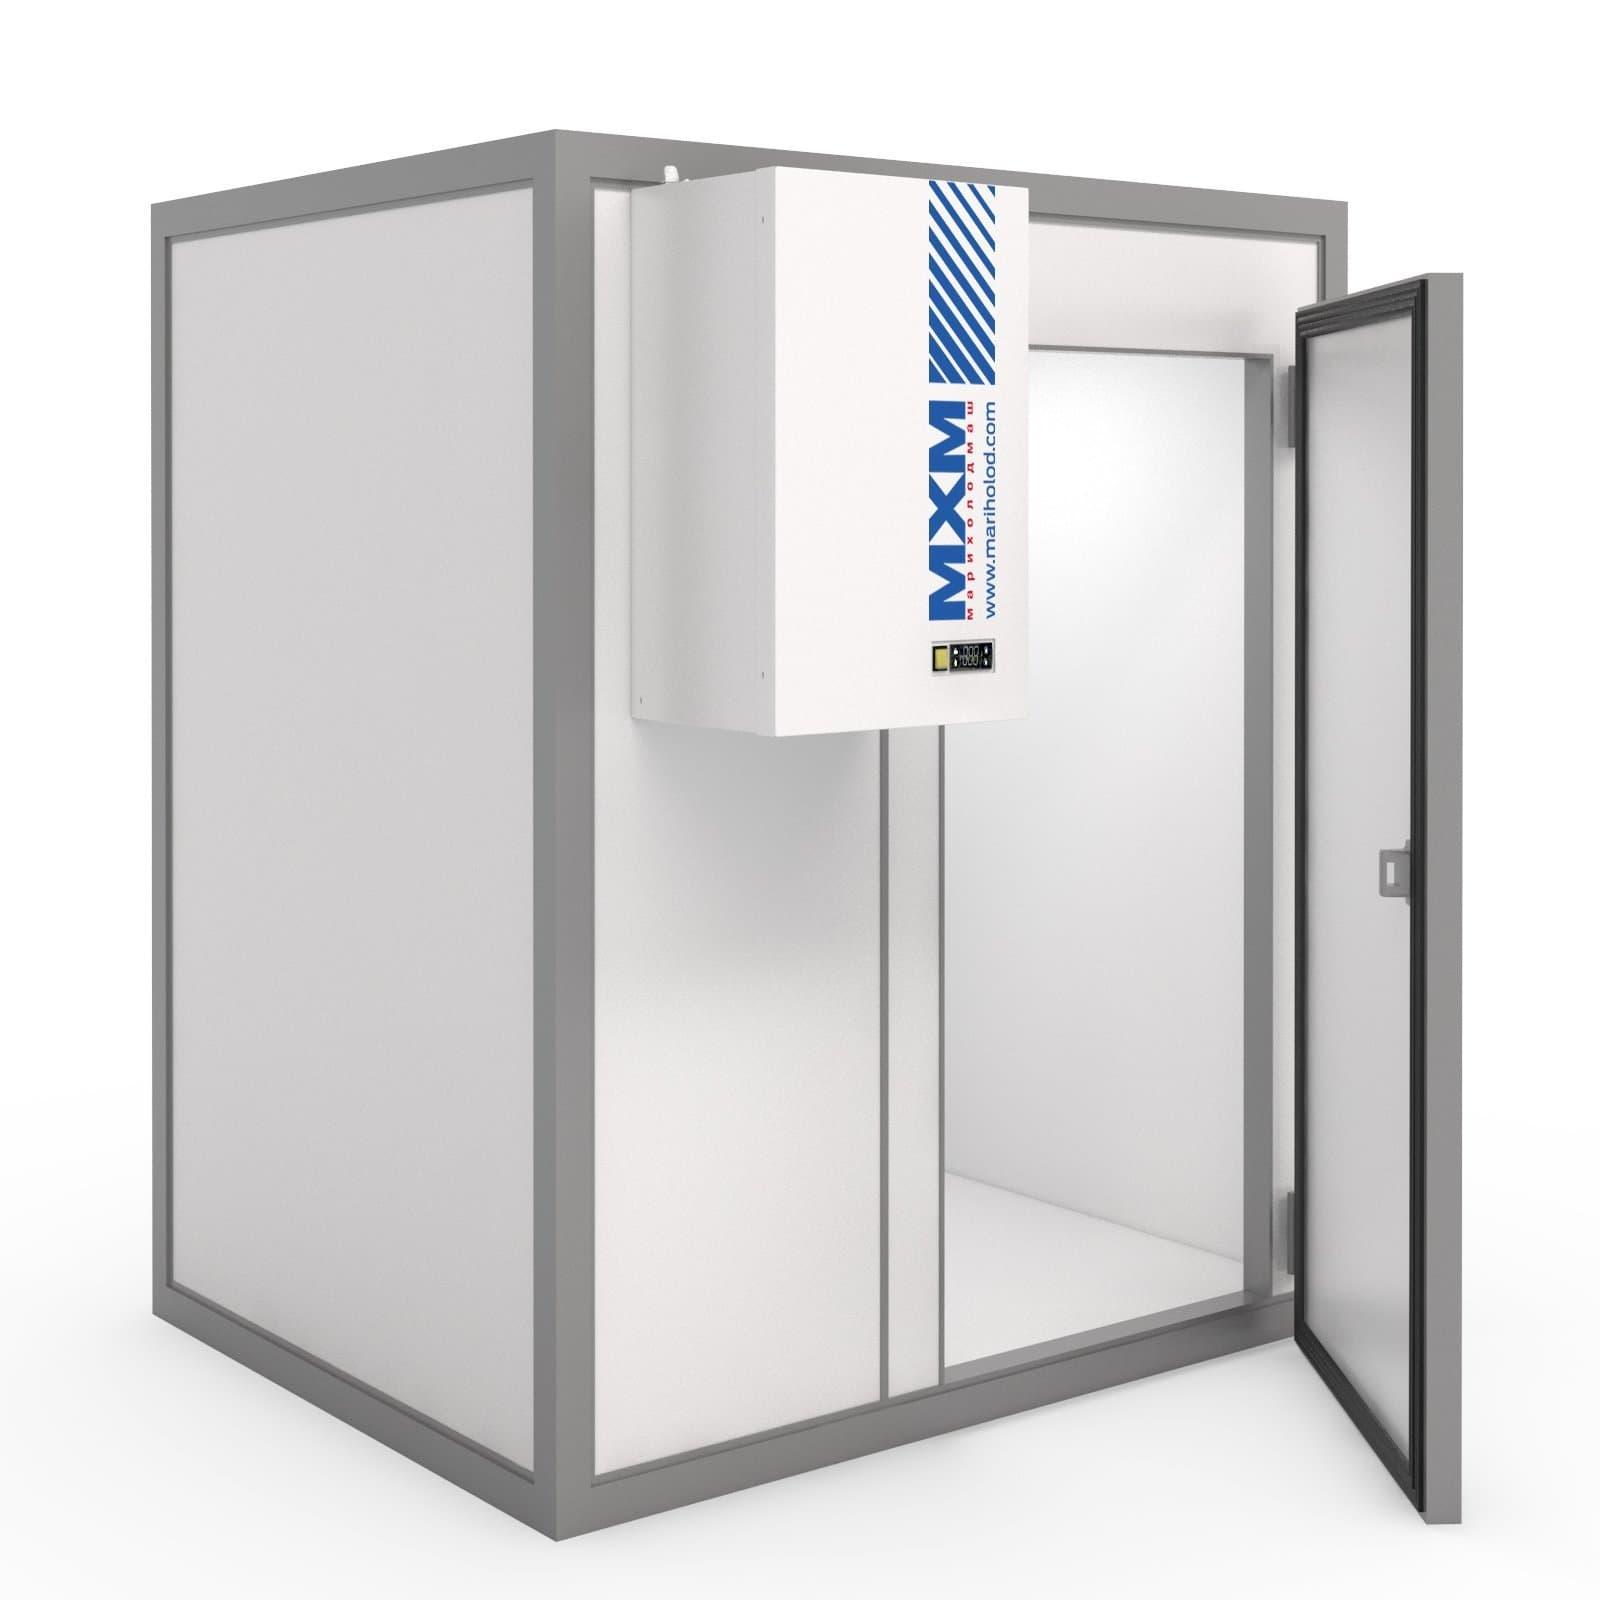 Камера холодильная МХМ КХН-6,91 1660×1960×2720